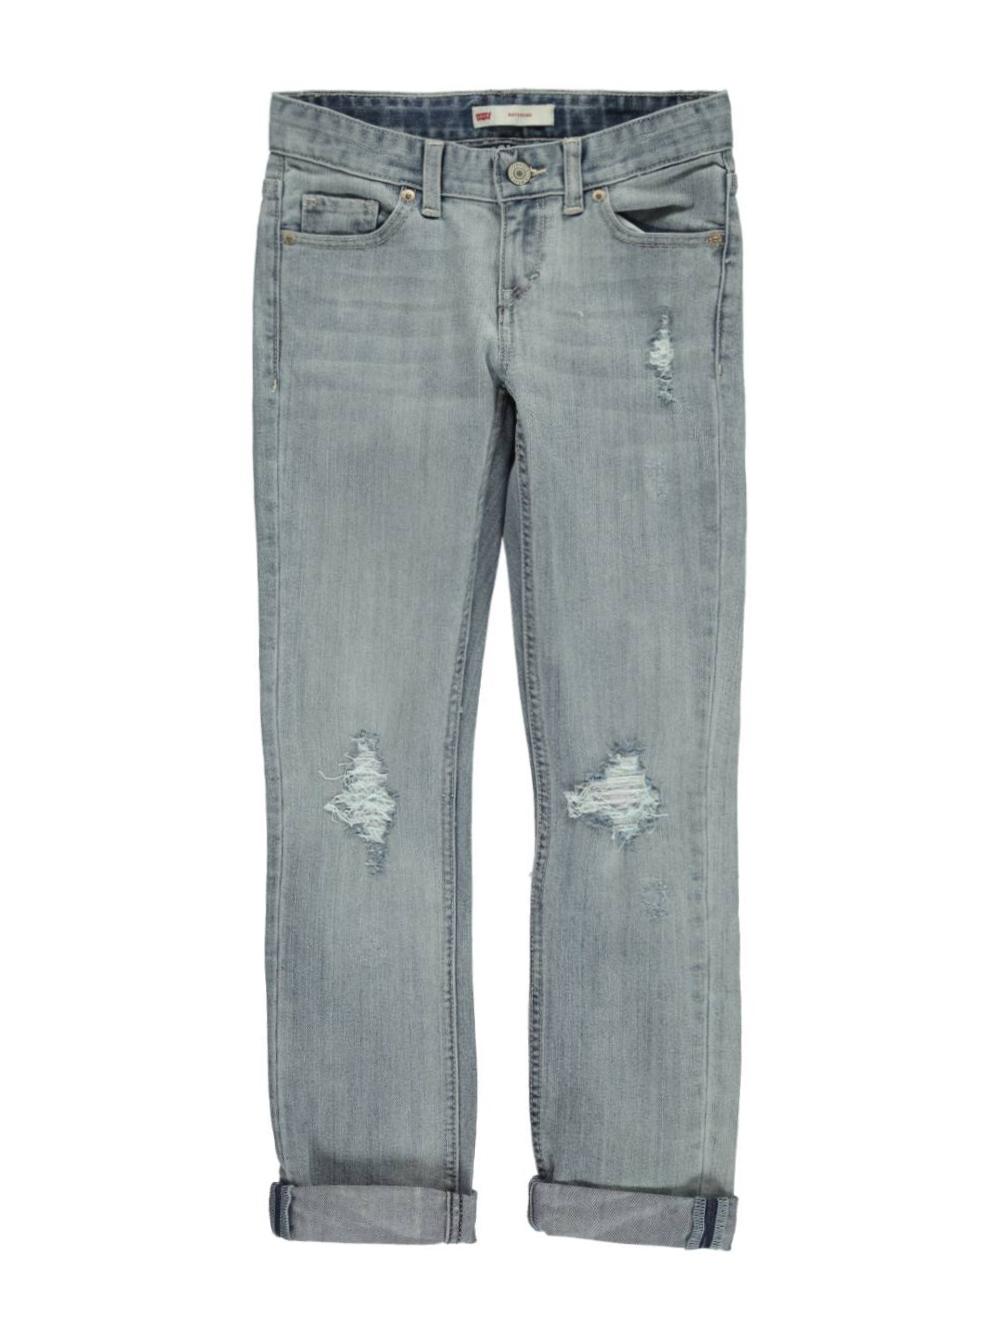 Image of Levis Big Girls Torn  Swooped Boyfriend Jeans Sizes 7  16  light blue 10